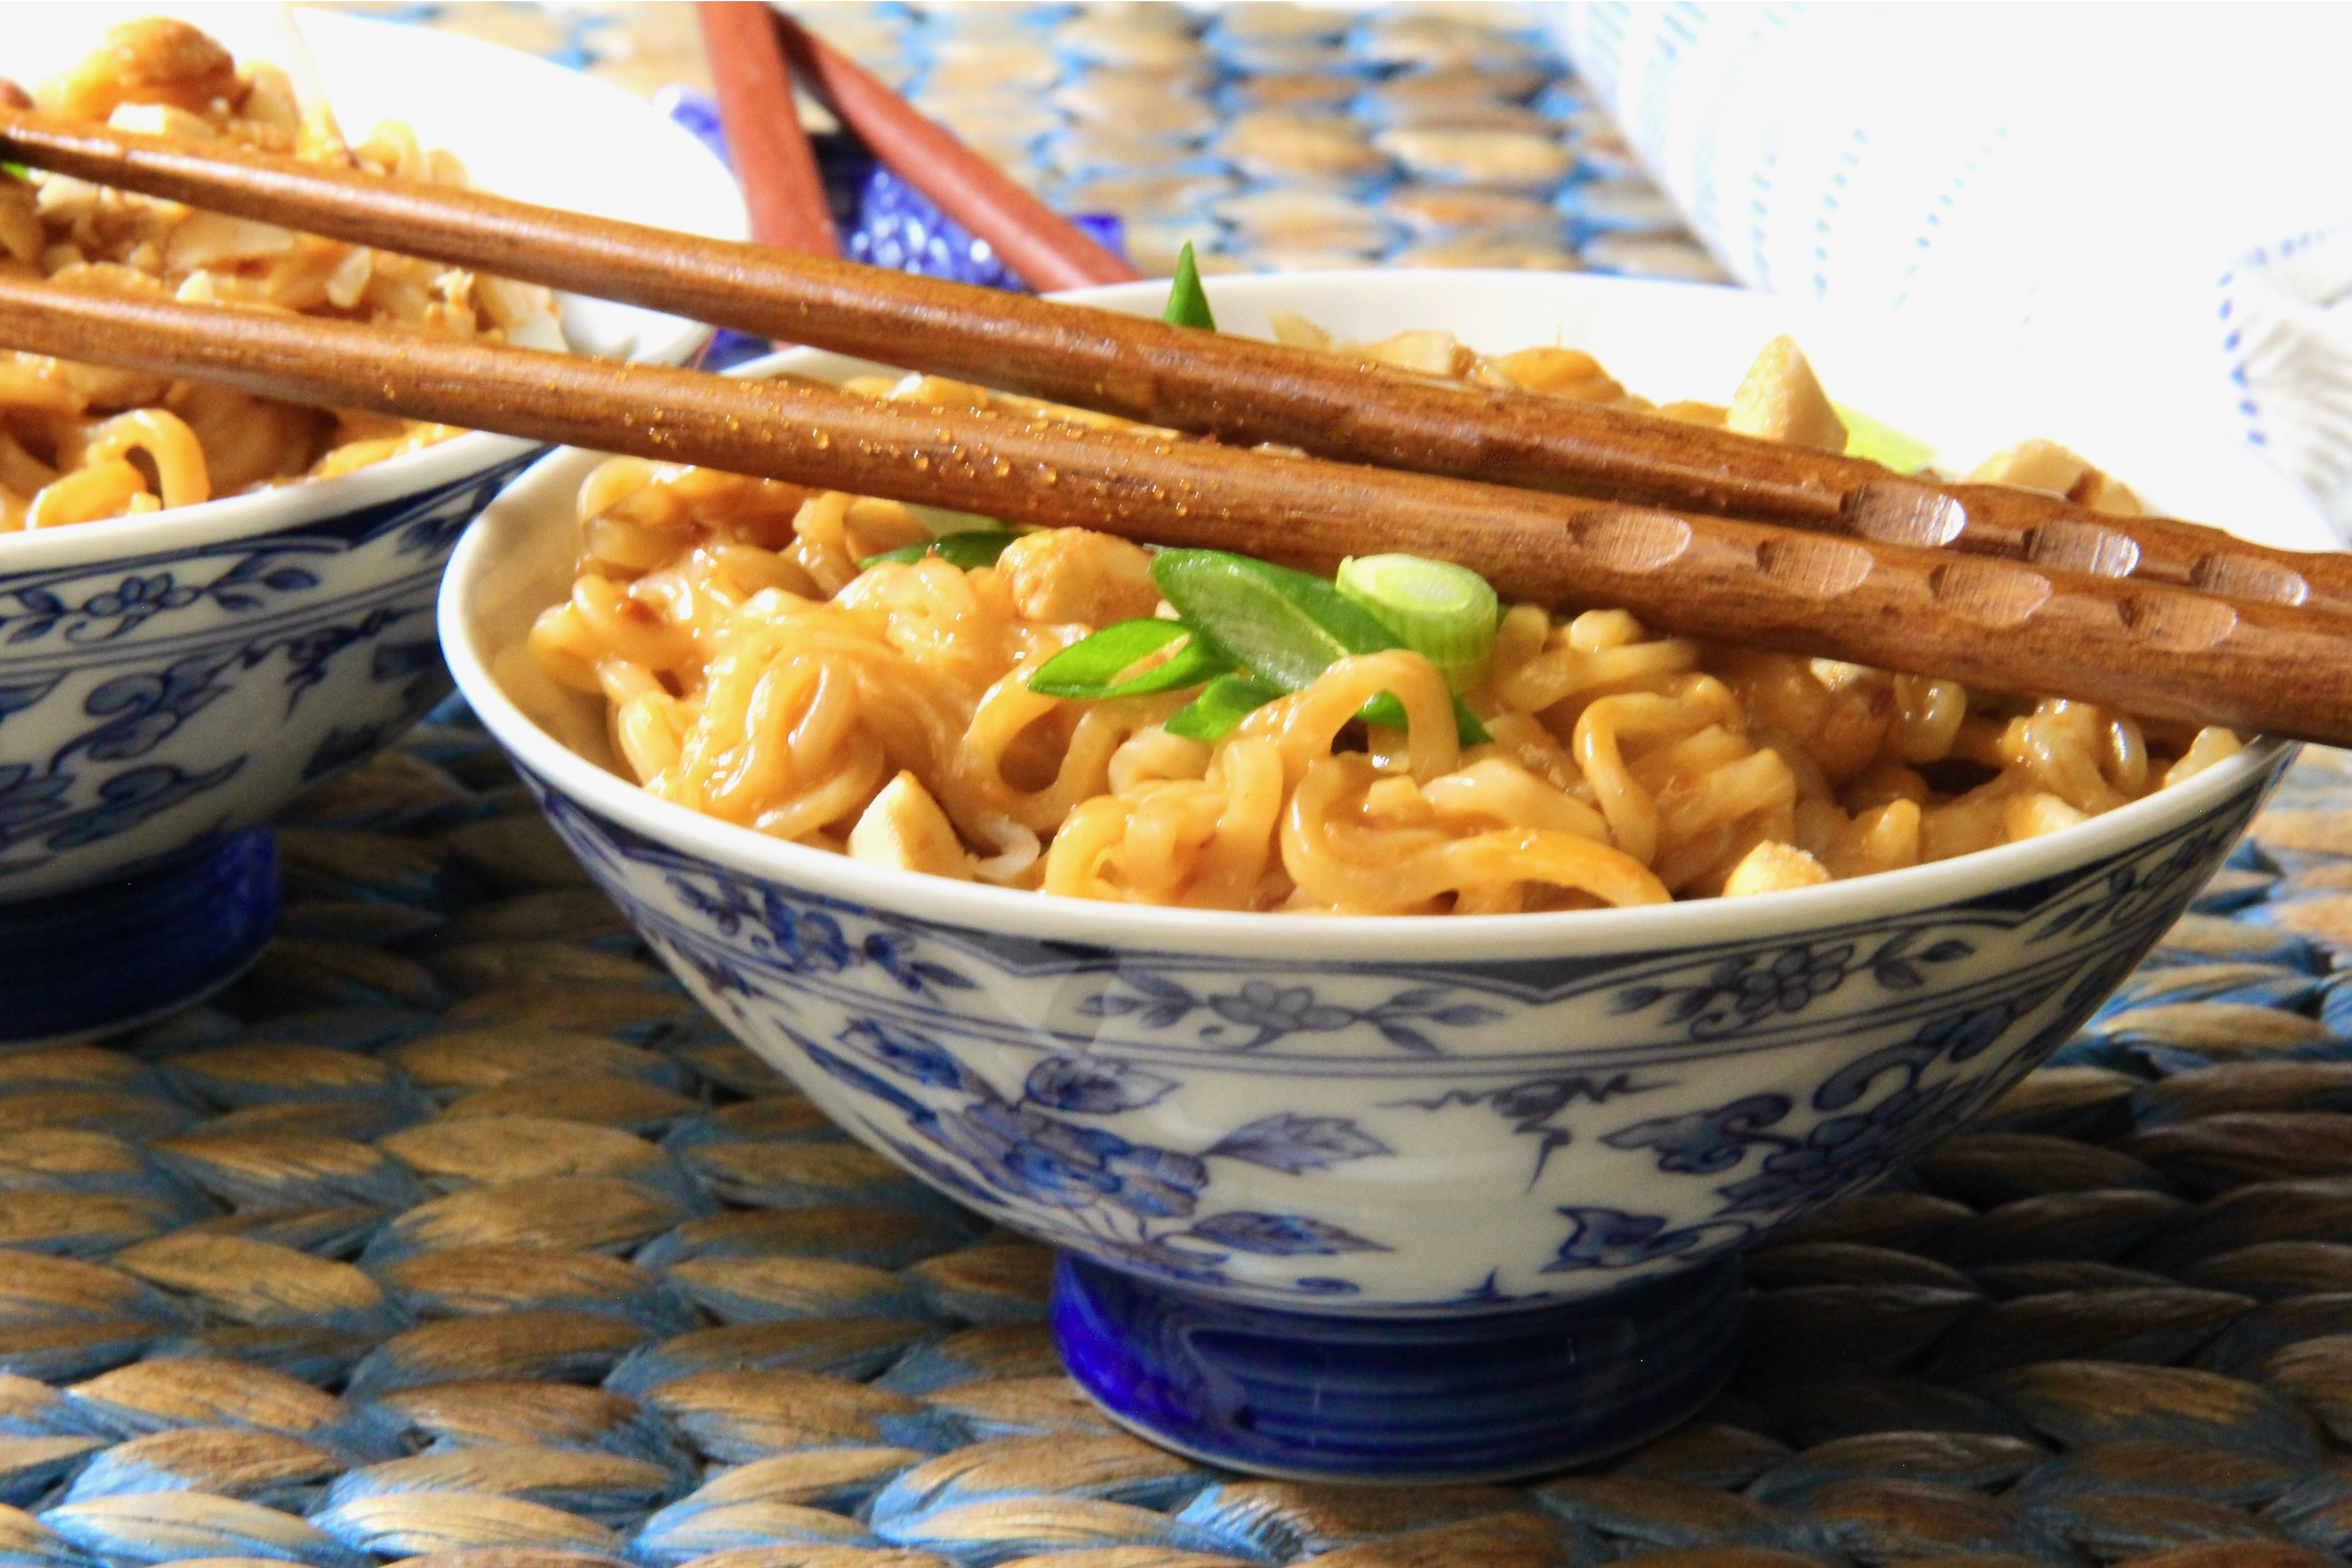 Spicy Asian Ramen Noodles